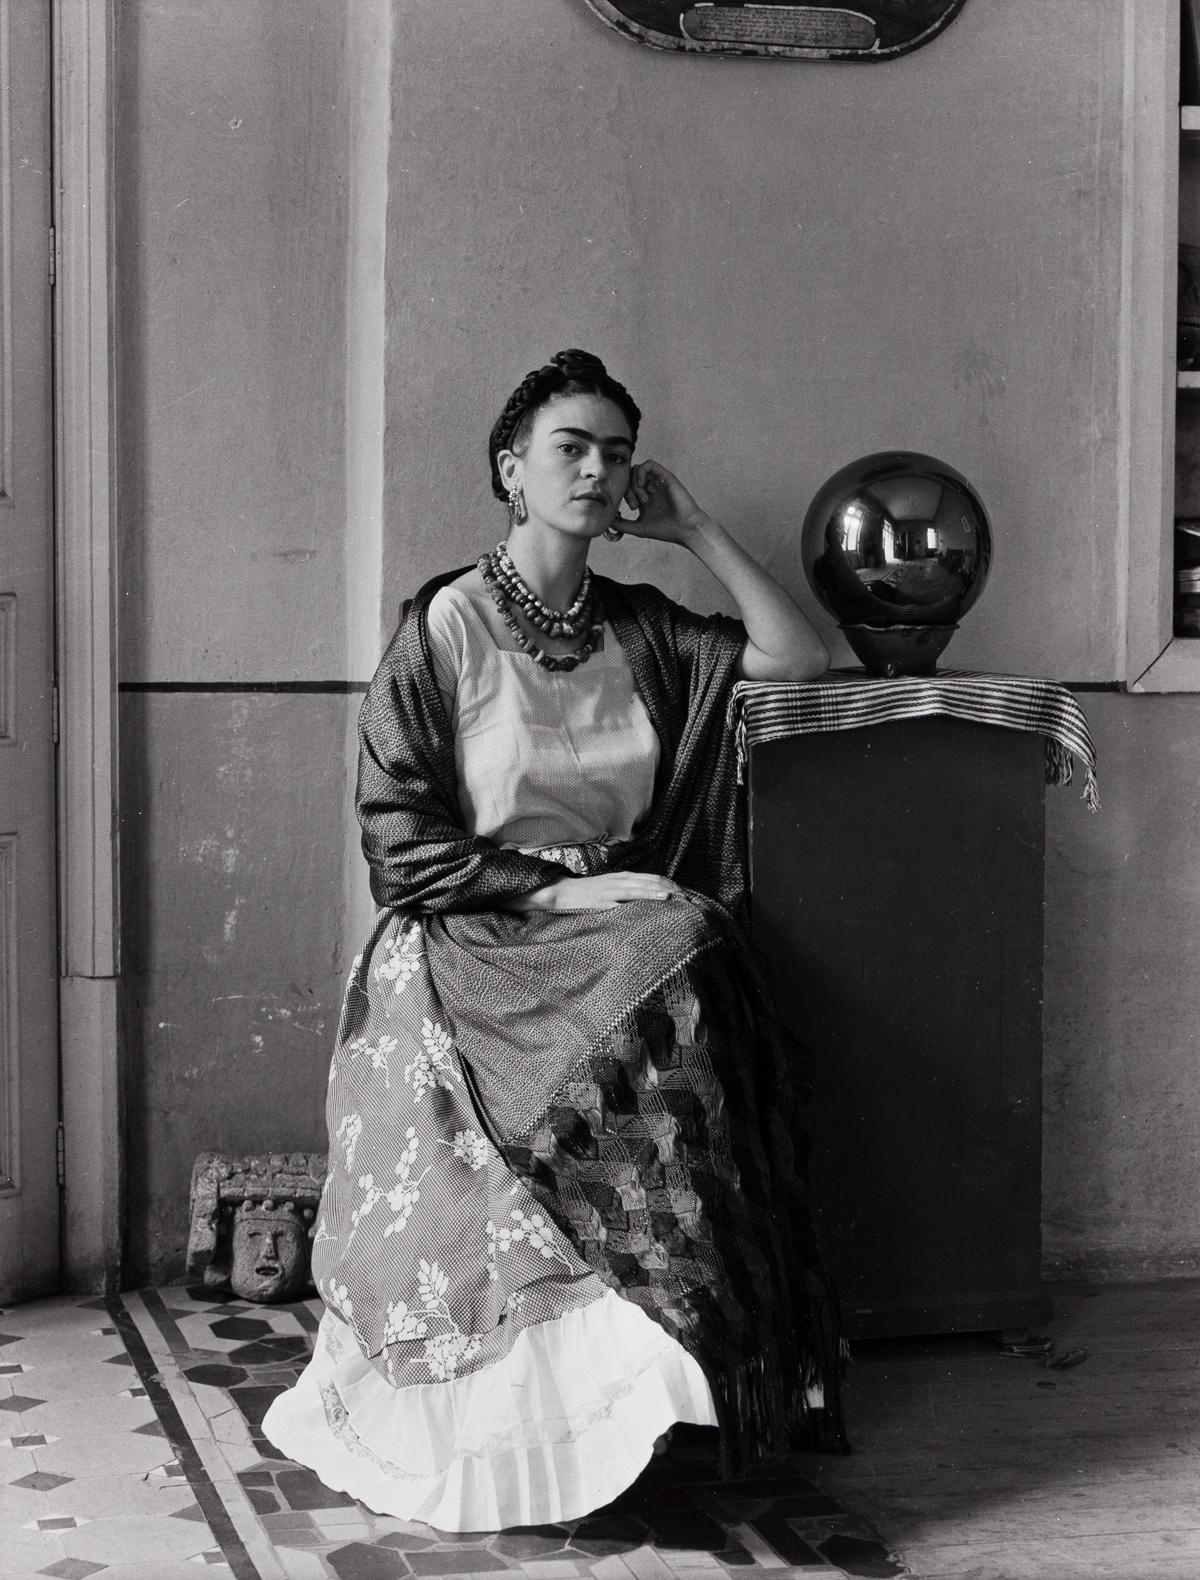 MANUEL ÁLVAREZ BRAVO (1902-2002) Frida Kahlo with globe.